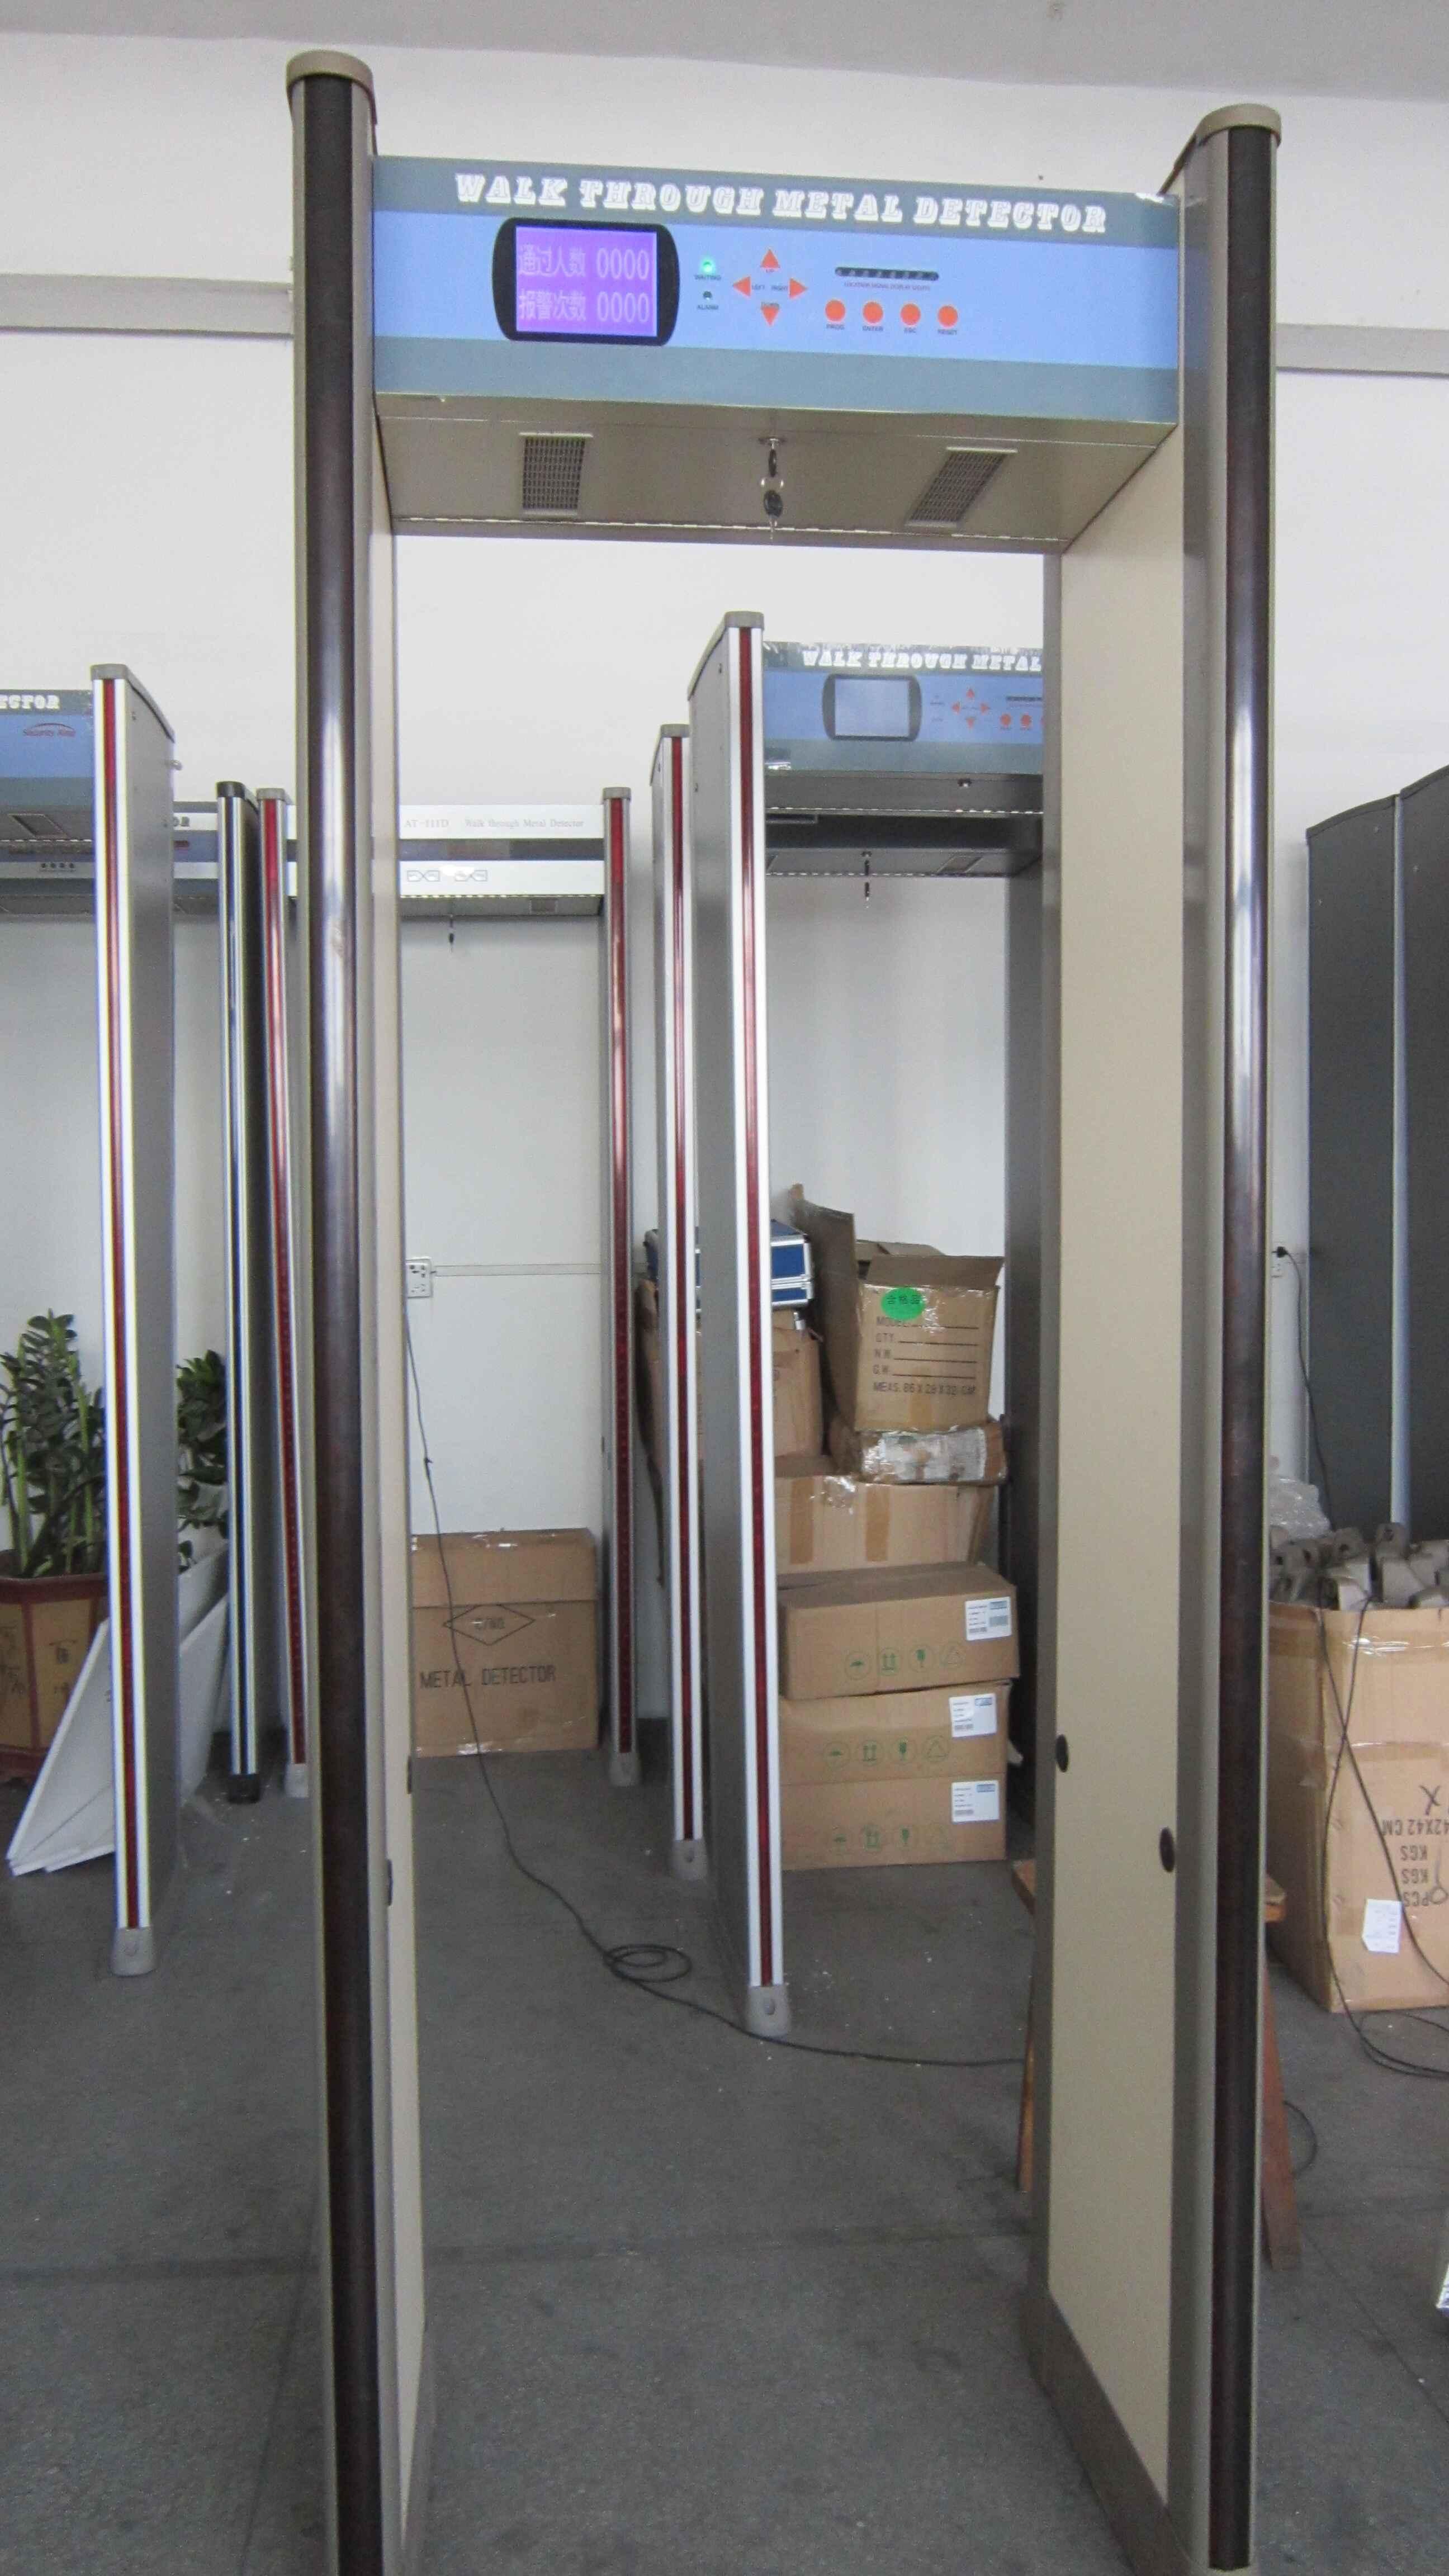 Walk-through metal detector JLS-200C